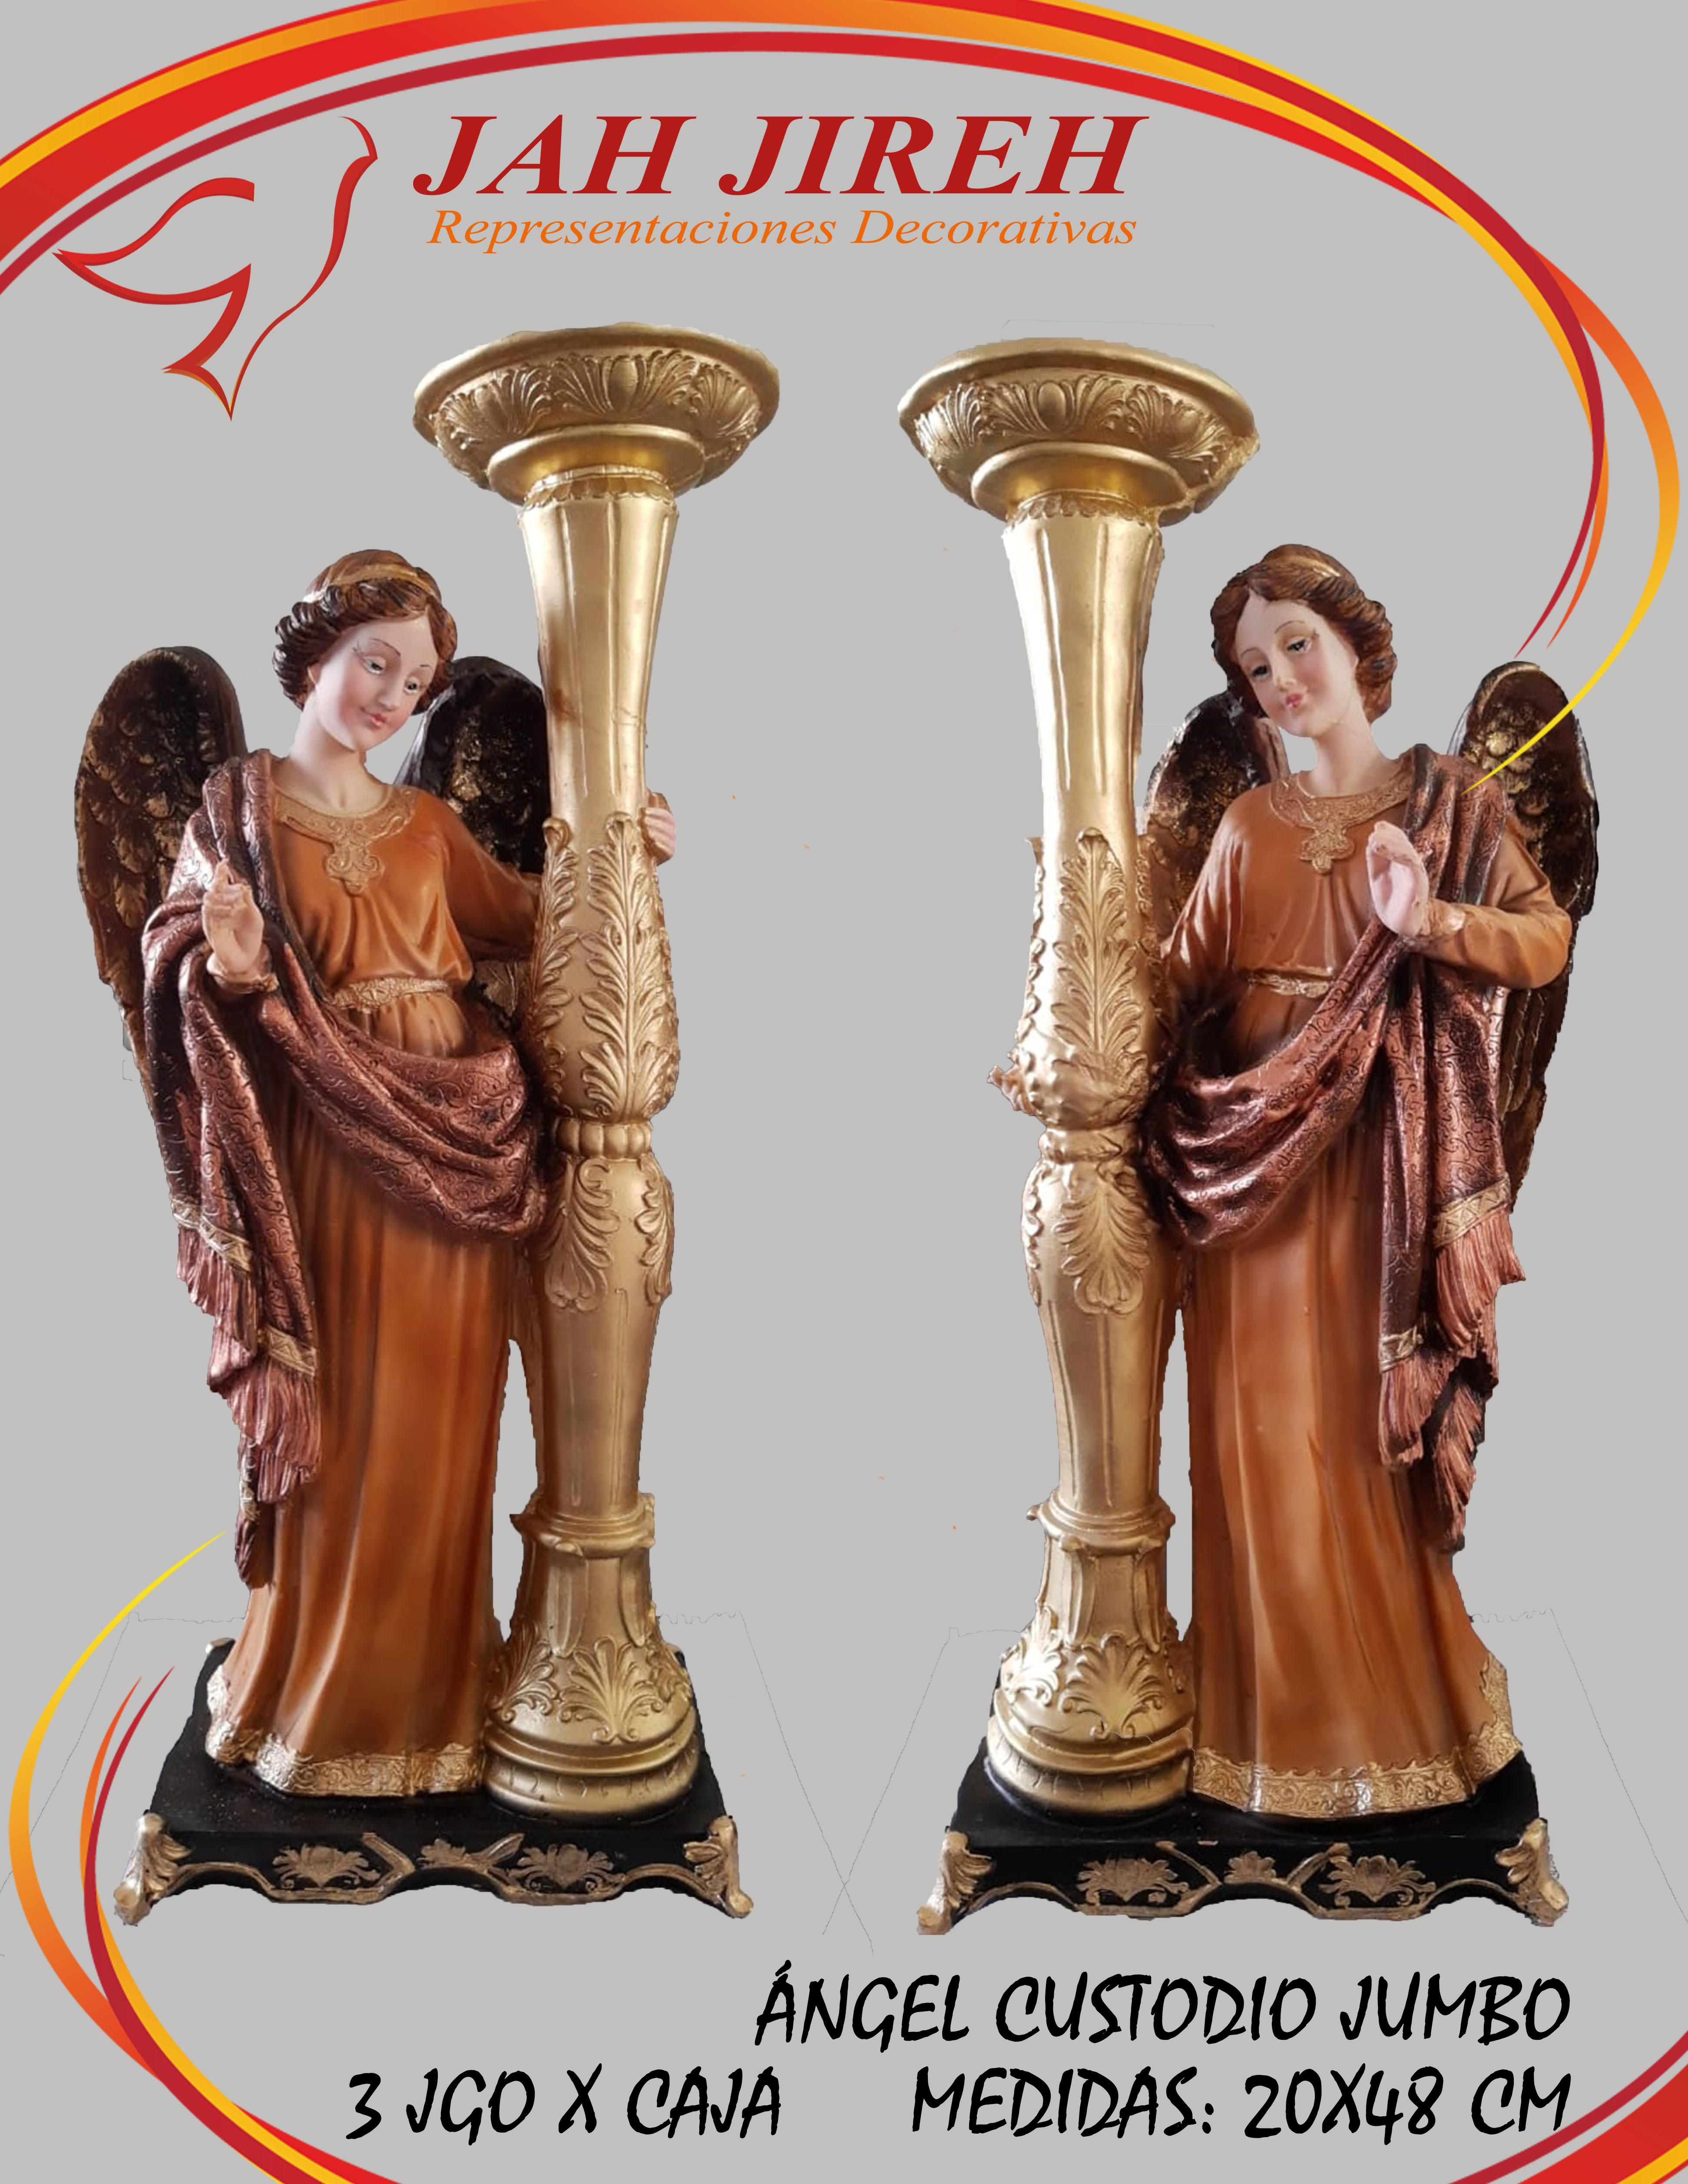 https://0201.nccdn.net/1_2/000/000/0cc/63b/angel-custodio-jumbo.jpg